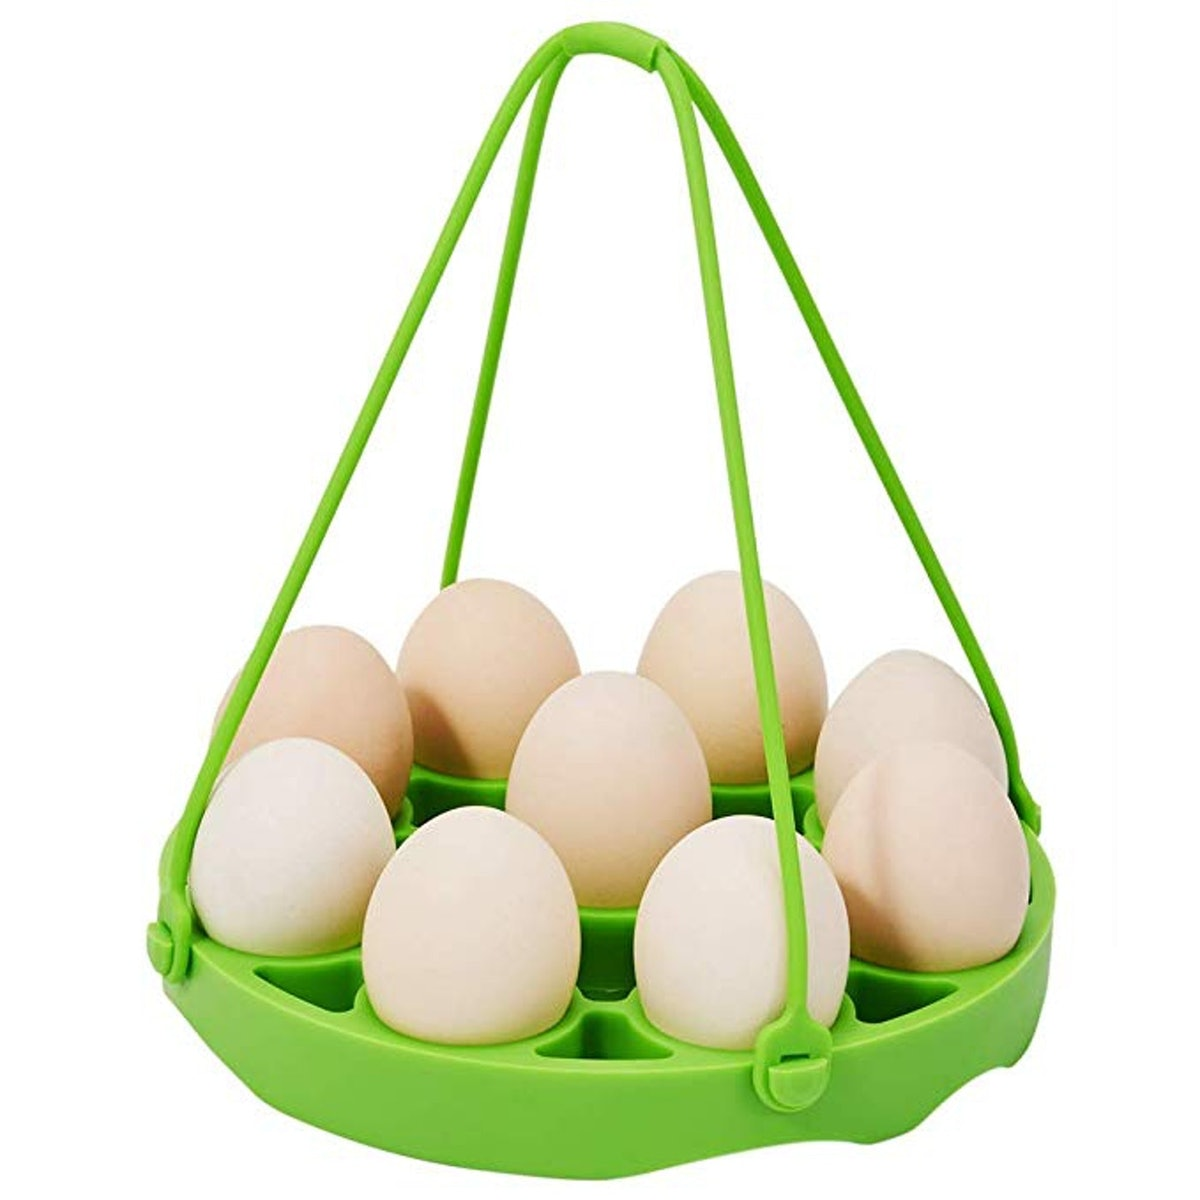 PRAMOO Silicone Egg Steamer Rack for Instant Pot